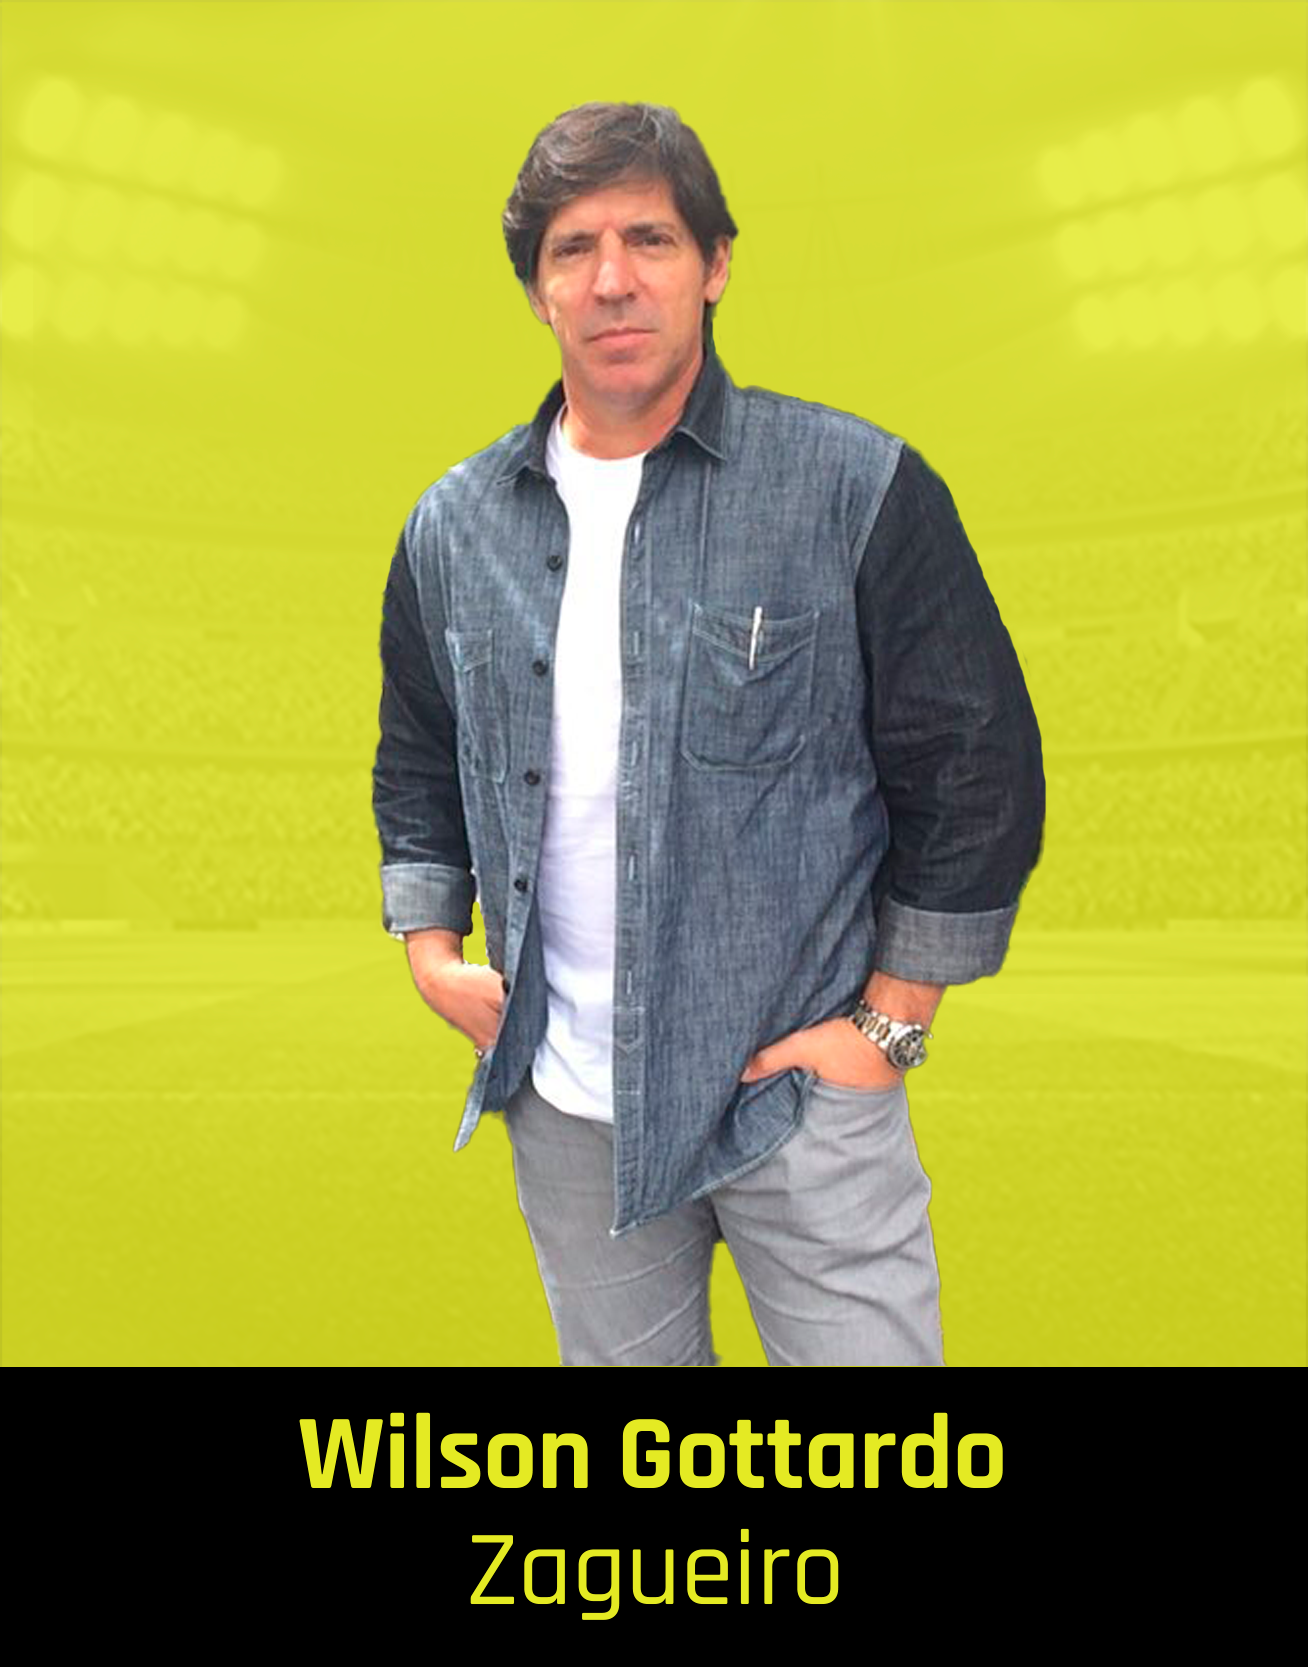 Wilson Gottardo